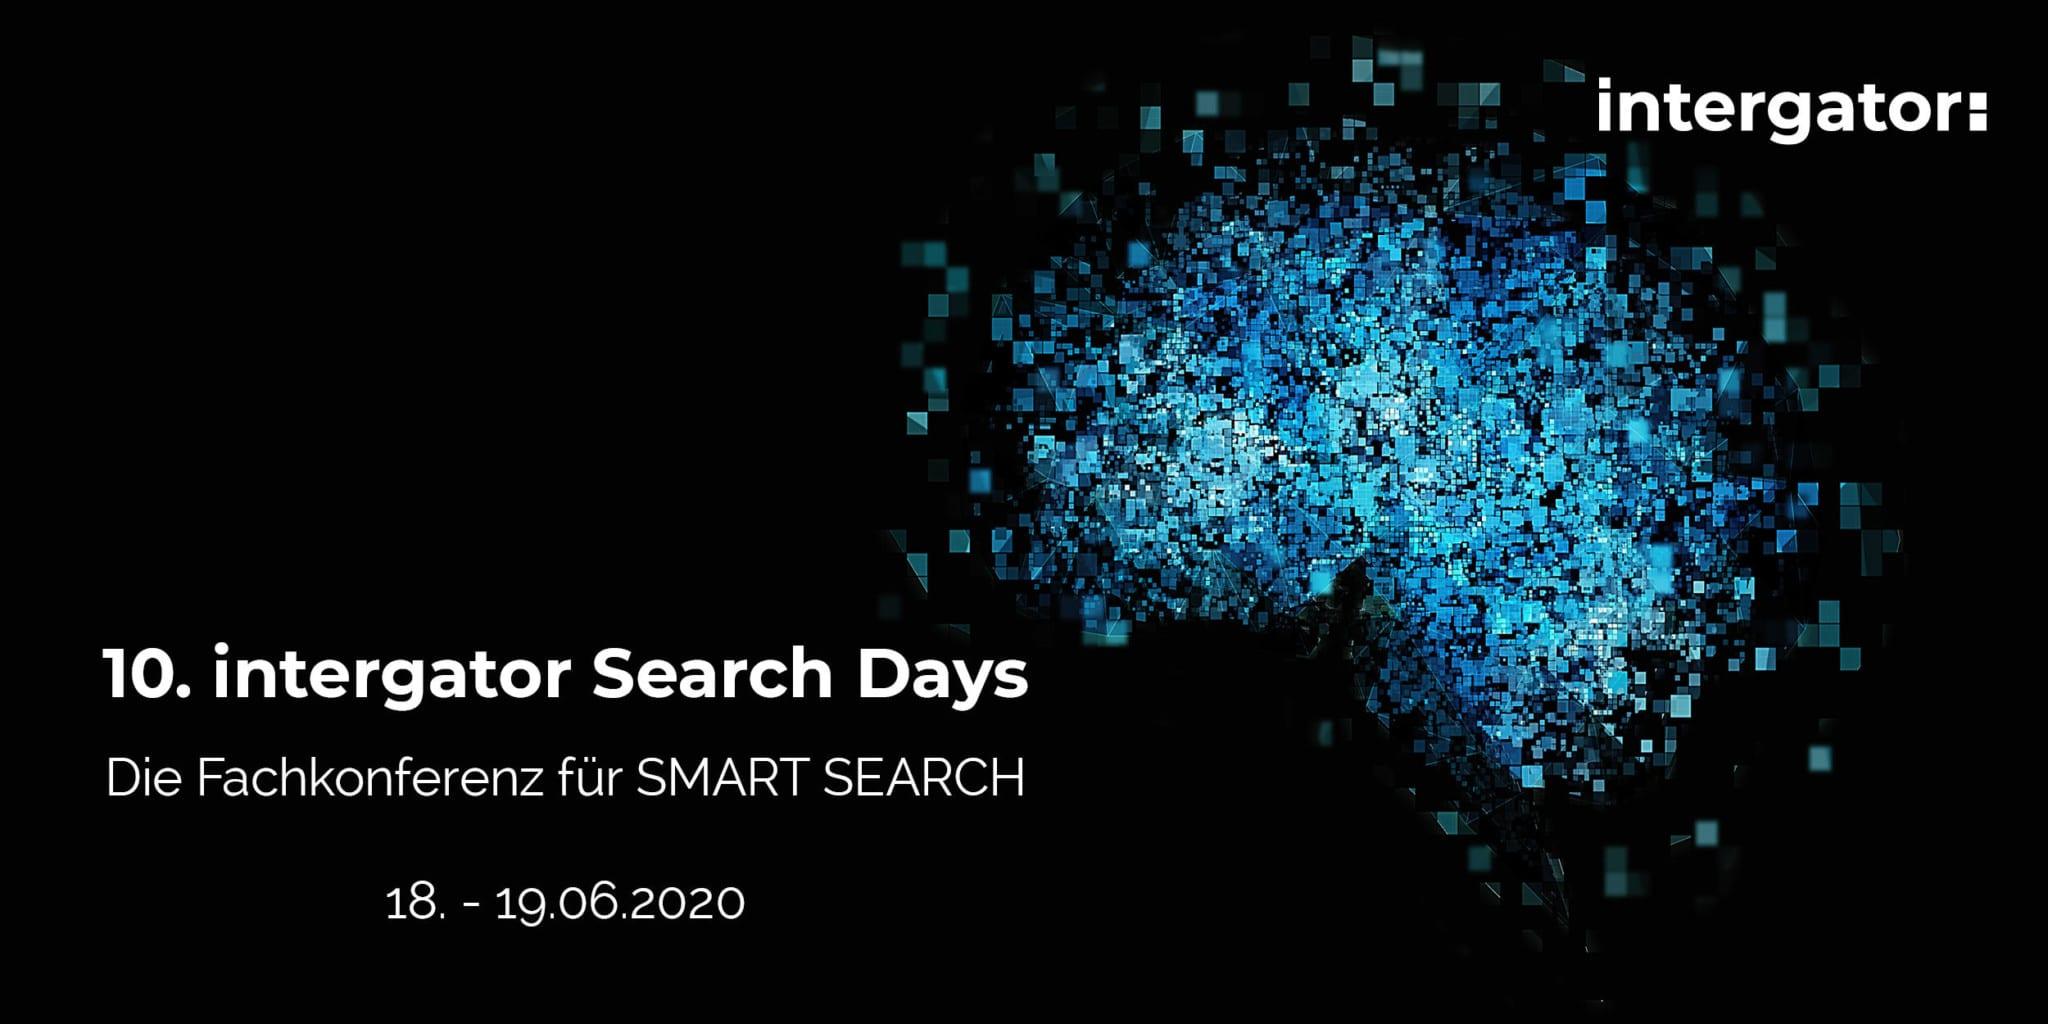 10. intergator Search Days